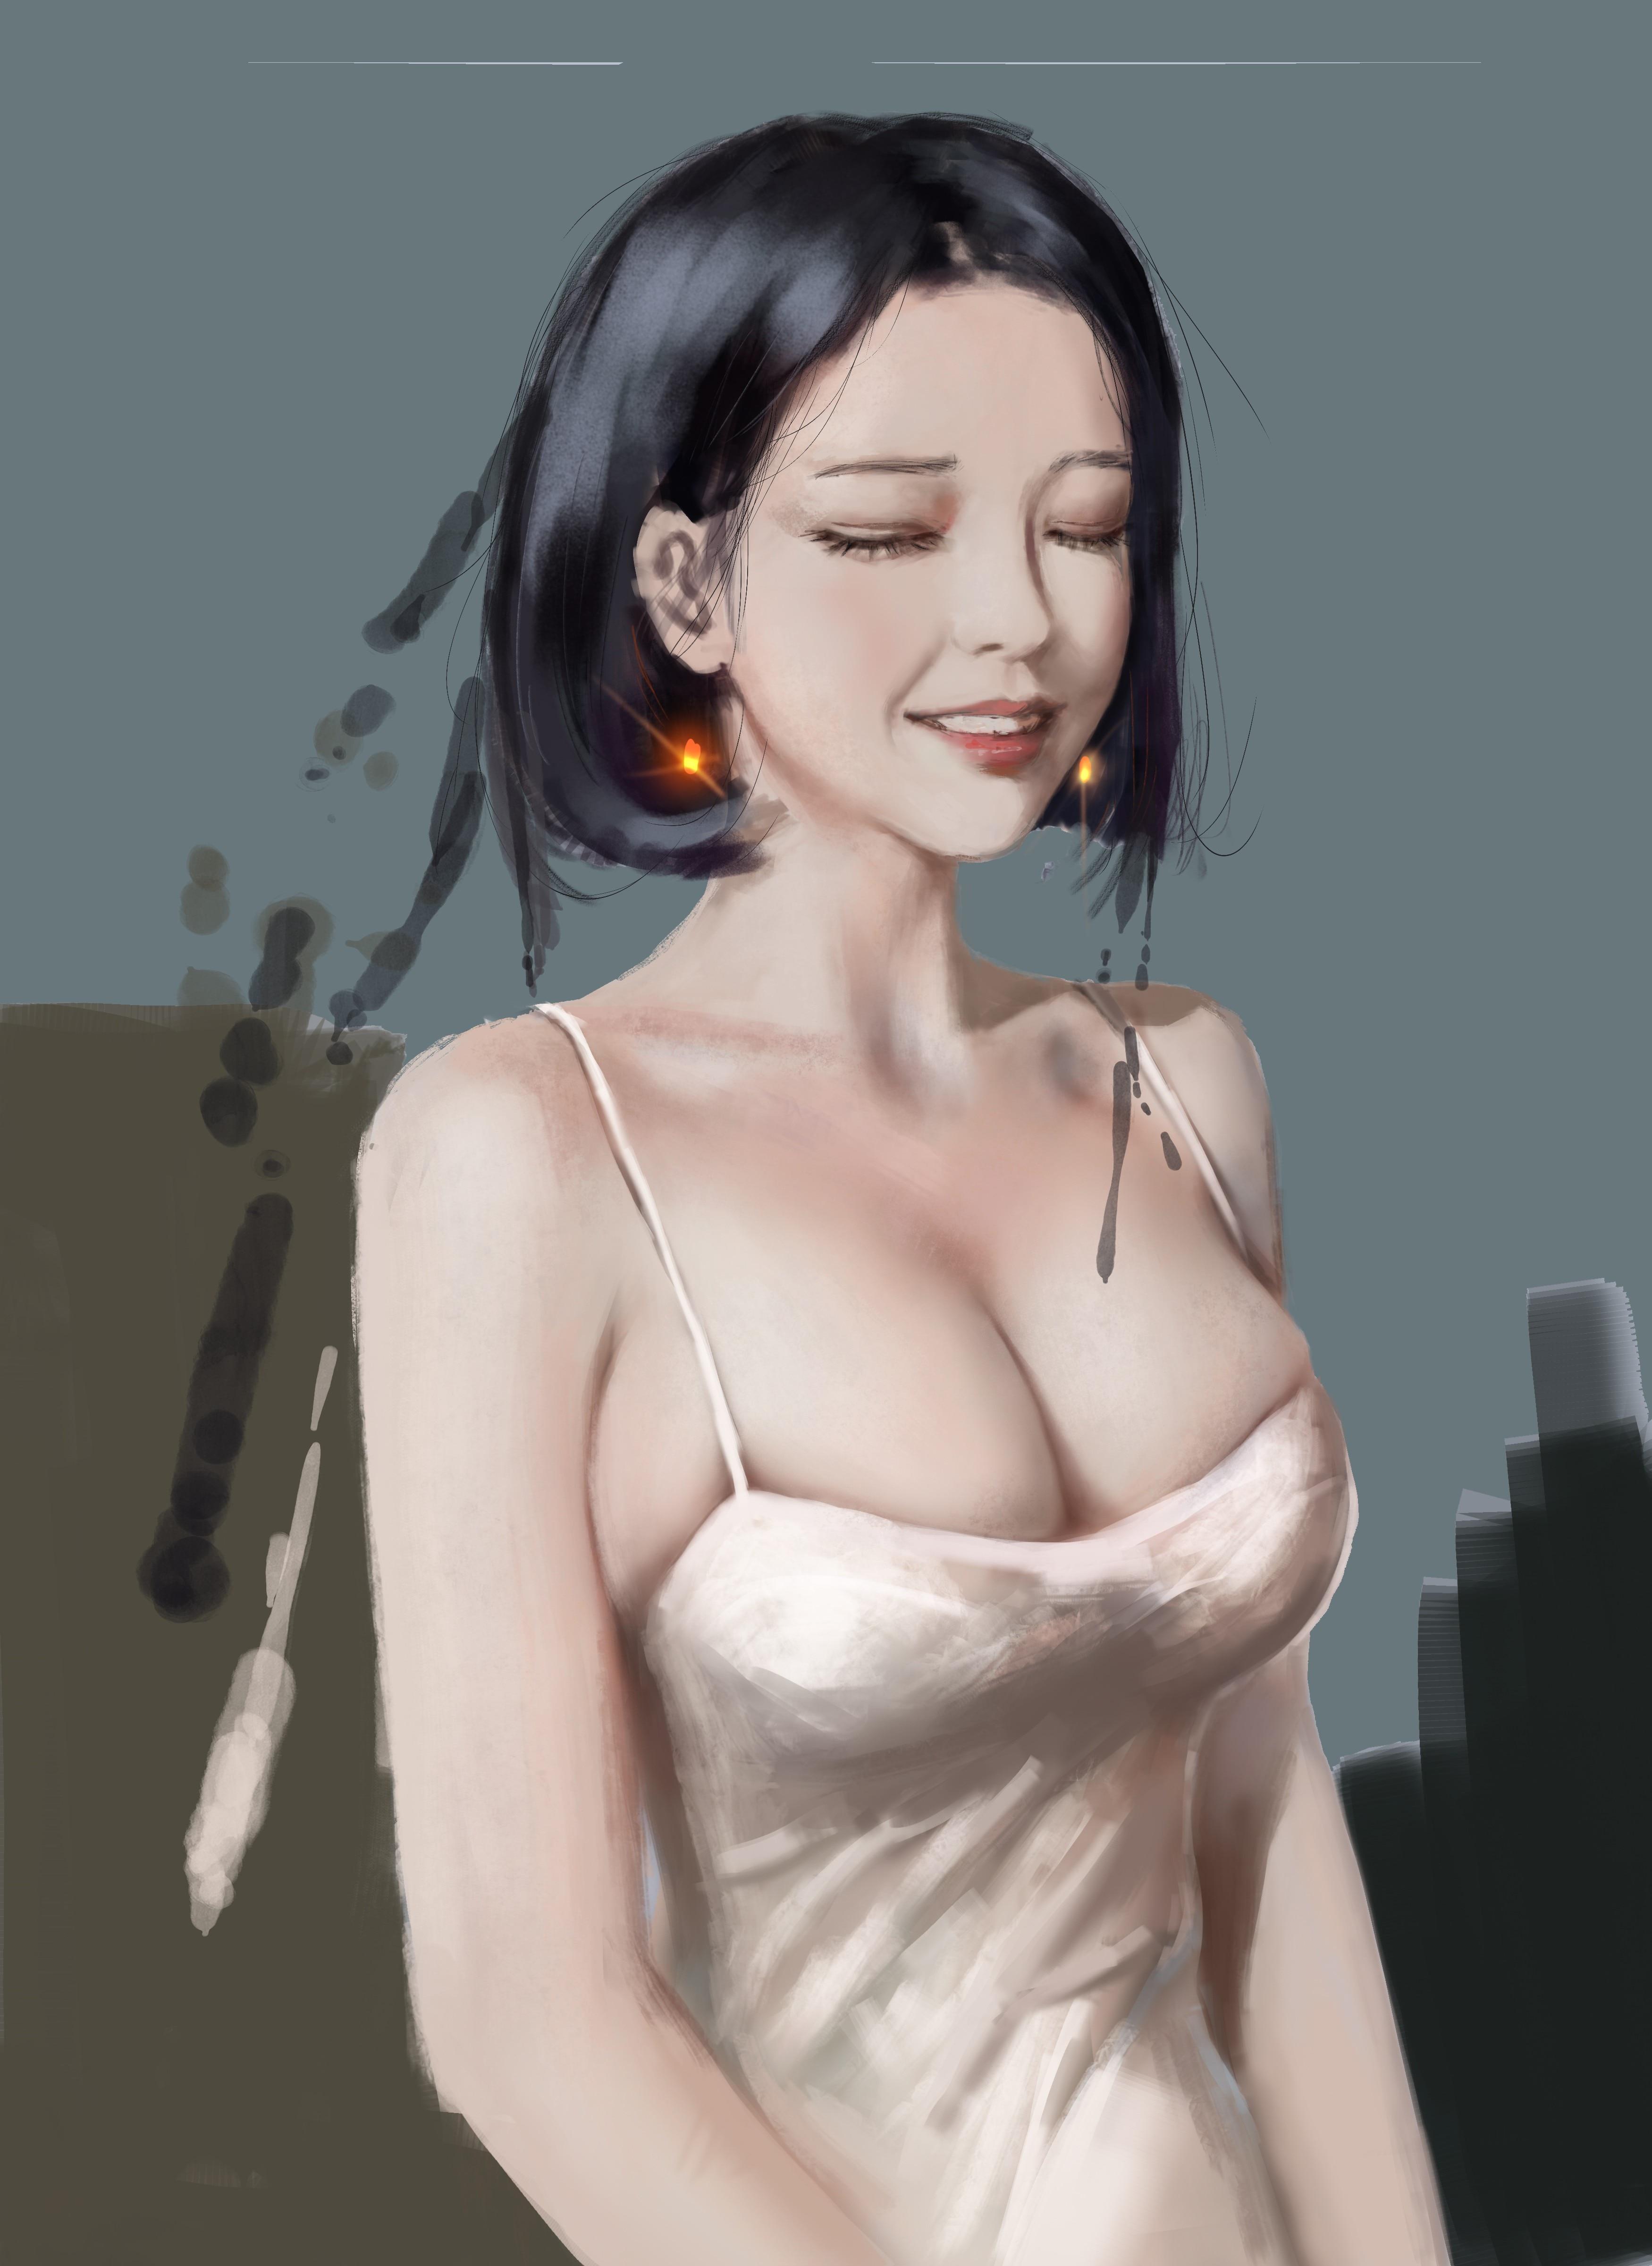 [P站]pixiv官网画师YDIYA id:17862658 福利壁纸特辑 第三弹